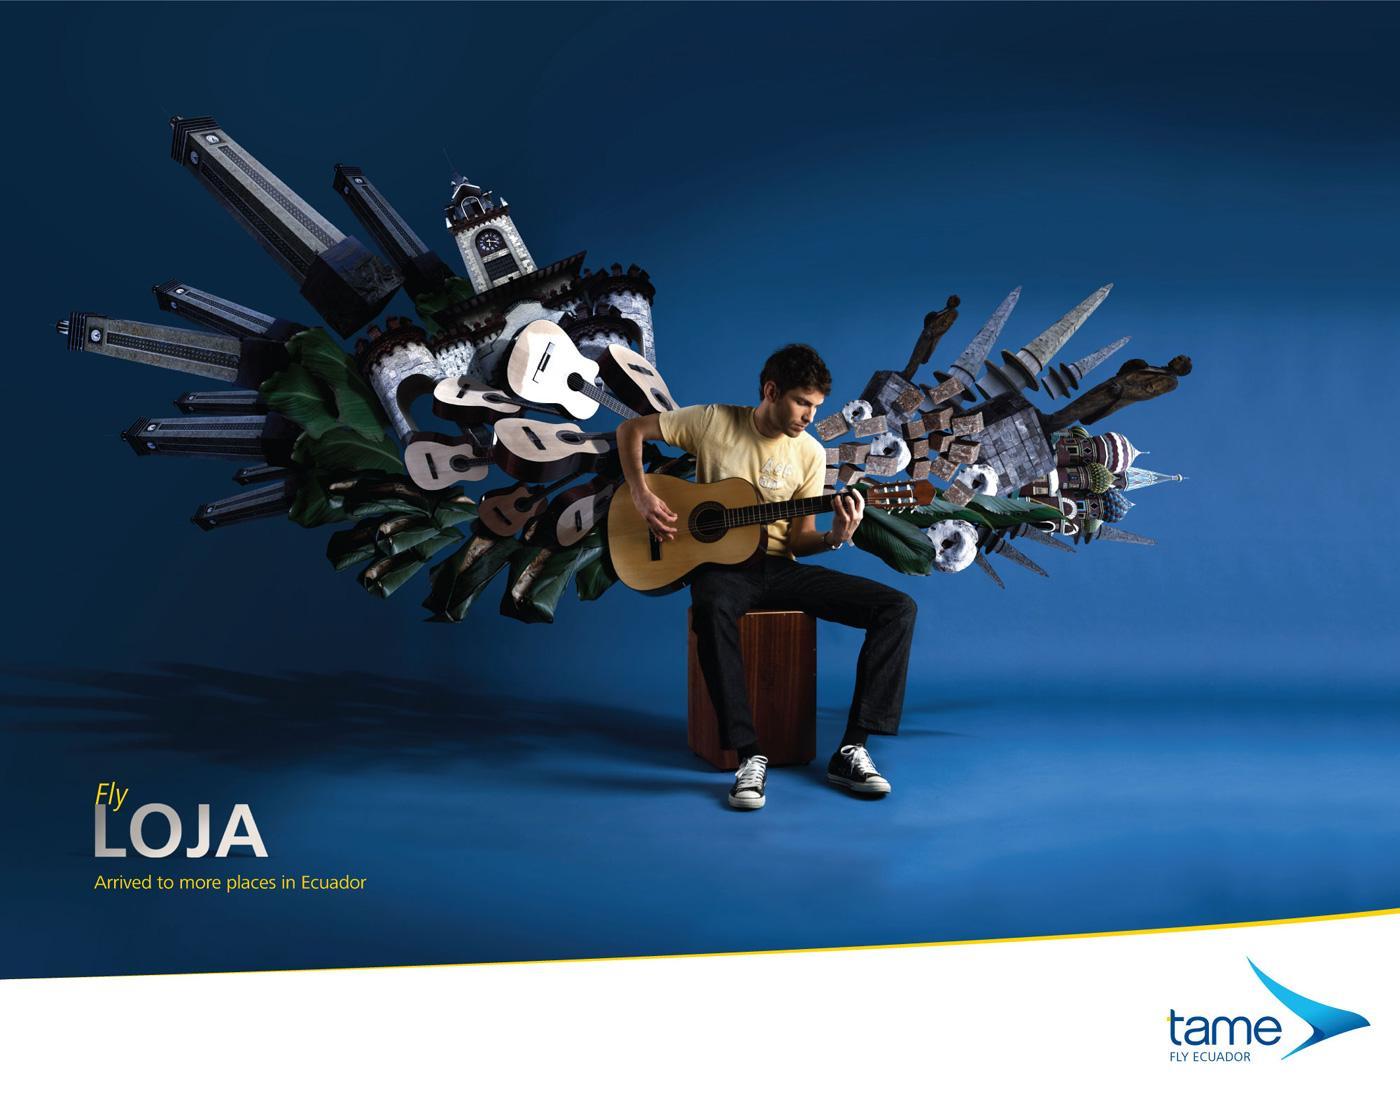 Tame Ecuador Airlines Print Ad -  Fly Loja